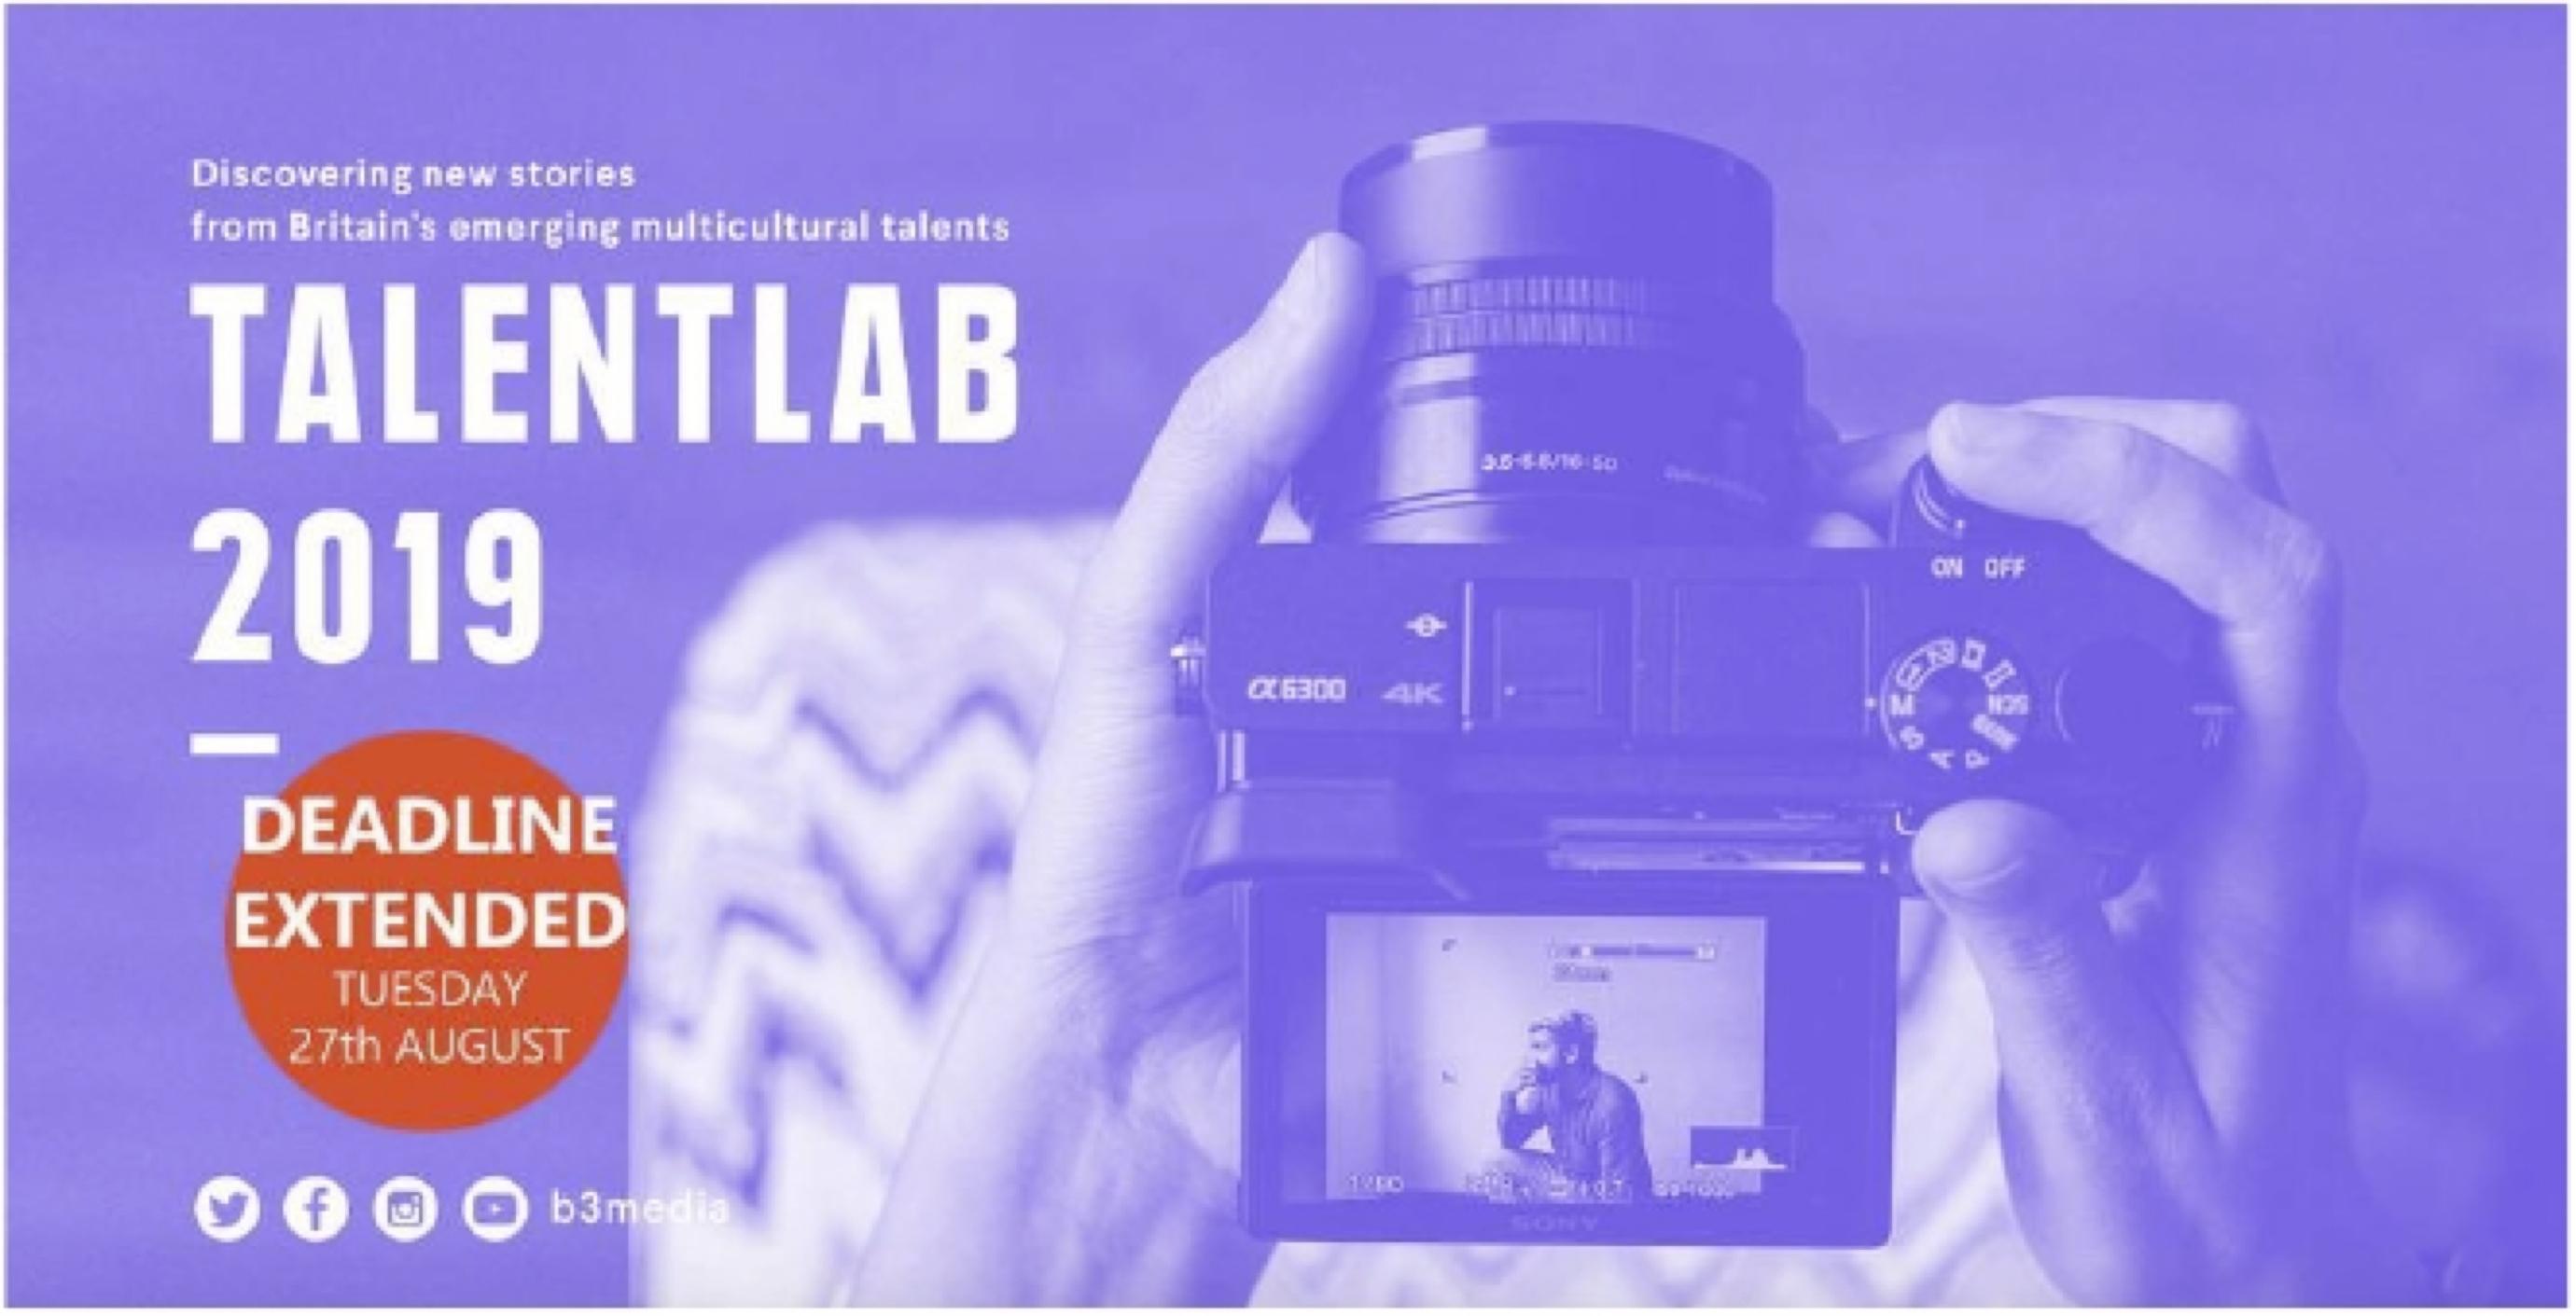 Talentlab 2019